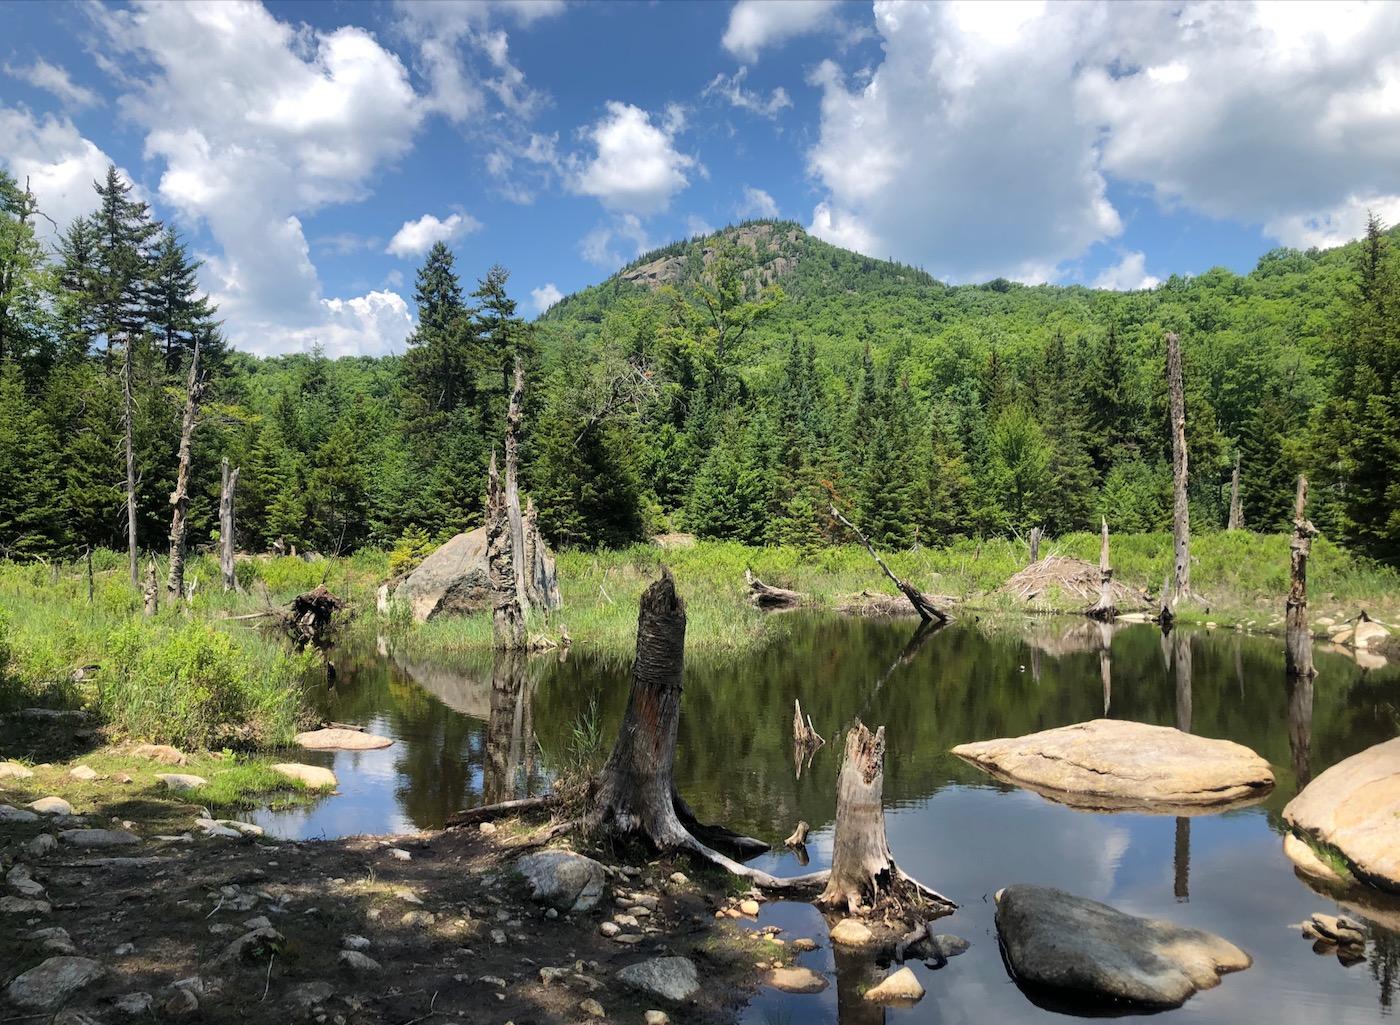 Peaked Mountain bog